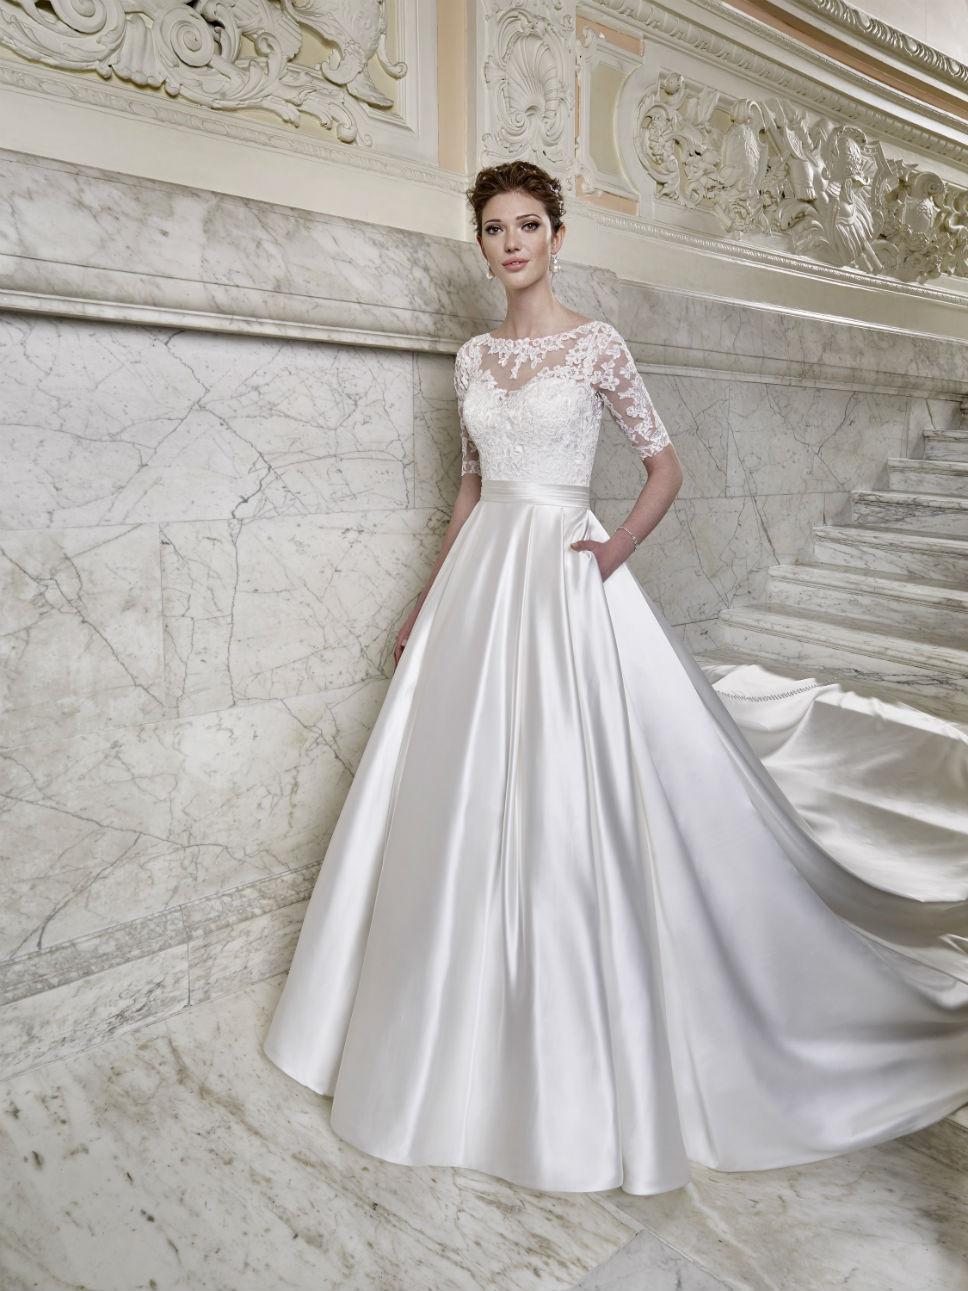 Royal Wedding Ellis Bridals Predict Princess Eugenie S Wedding Dress Bridal Editor